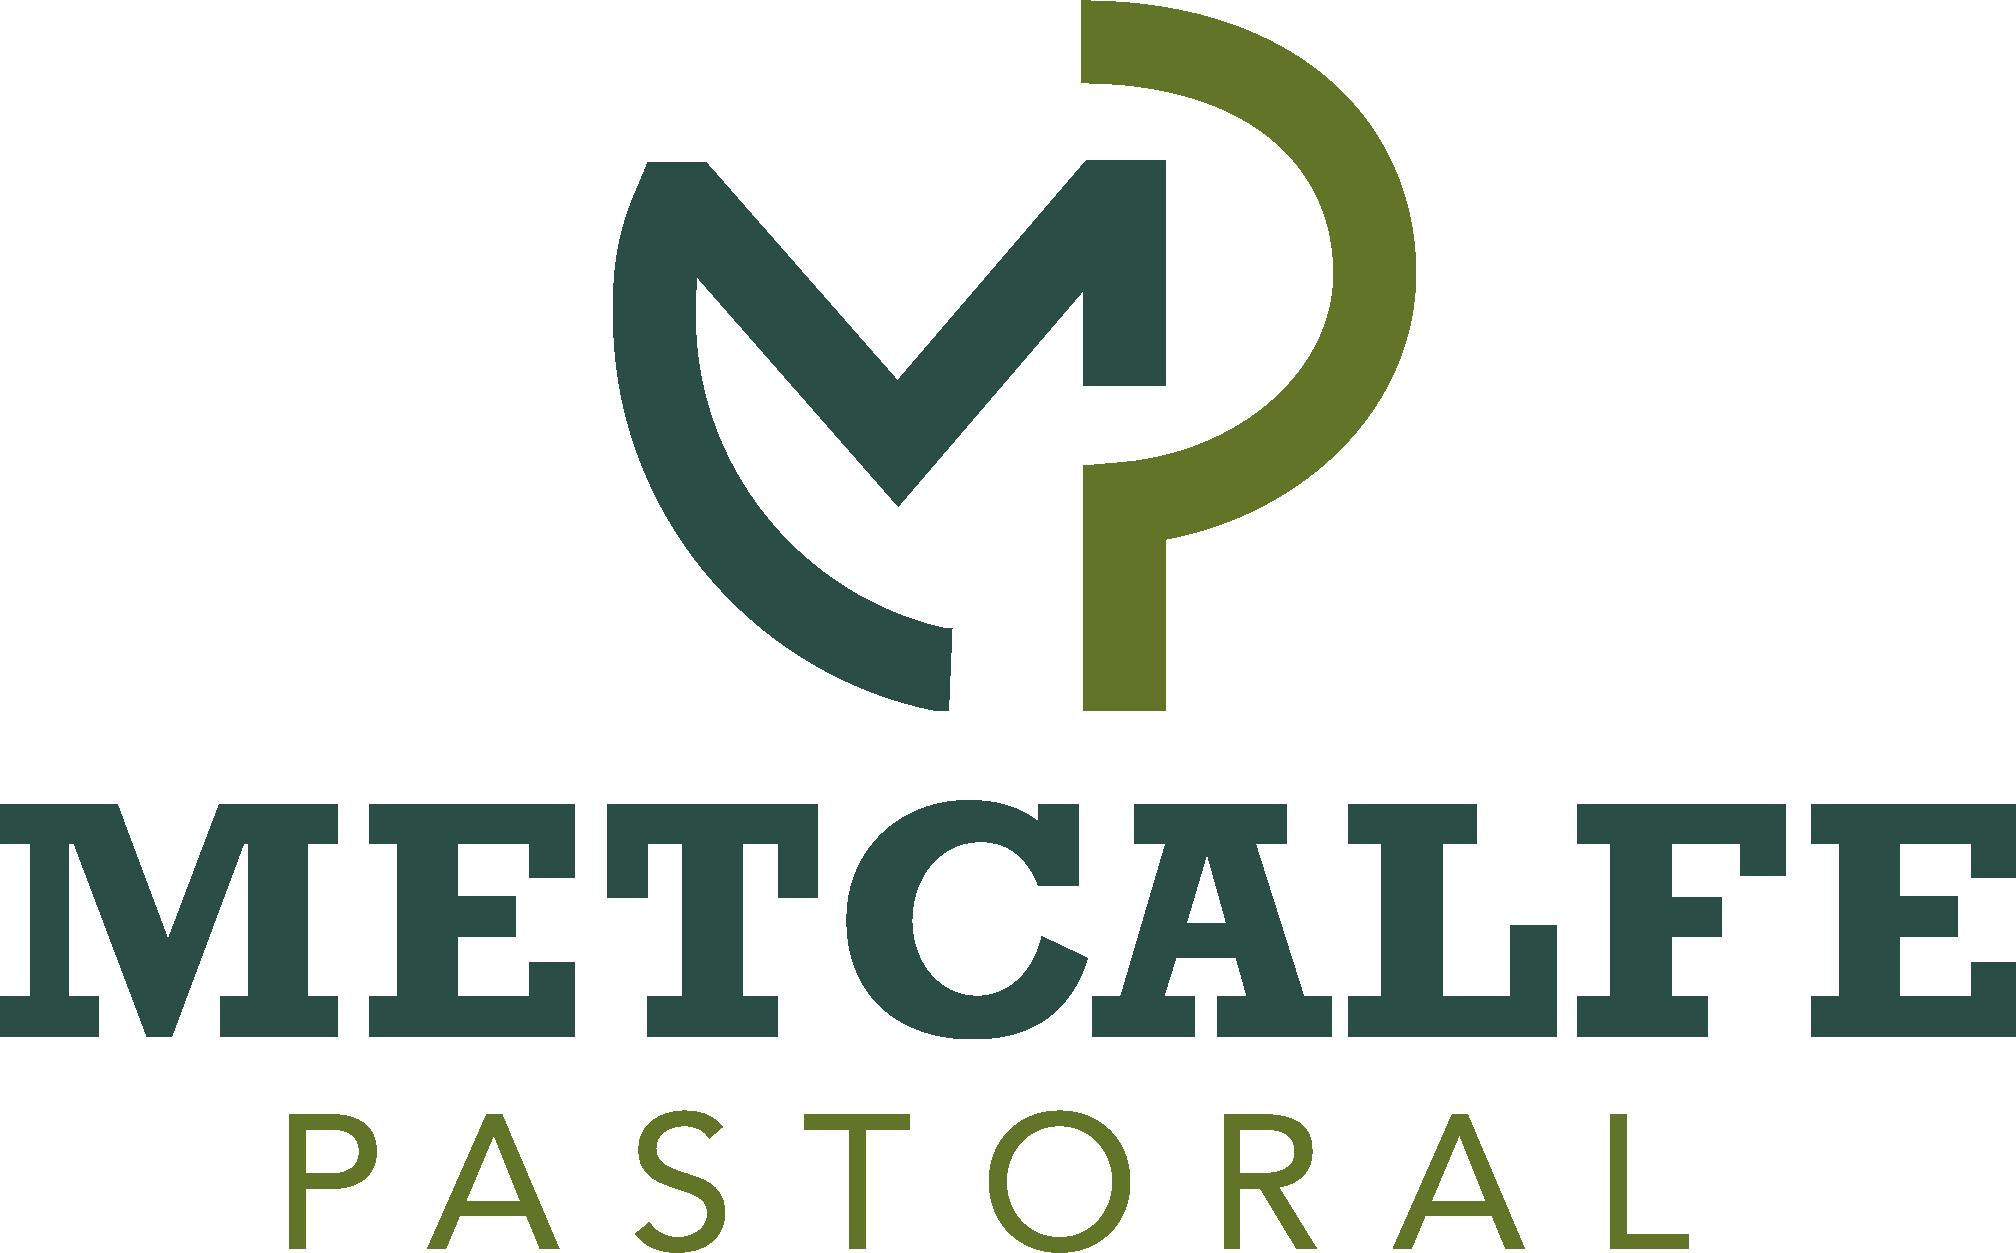 MetcalfePastoral_Logo-CMYK_June2019.jpg